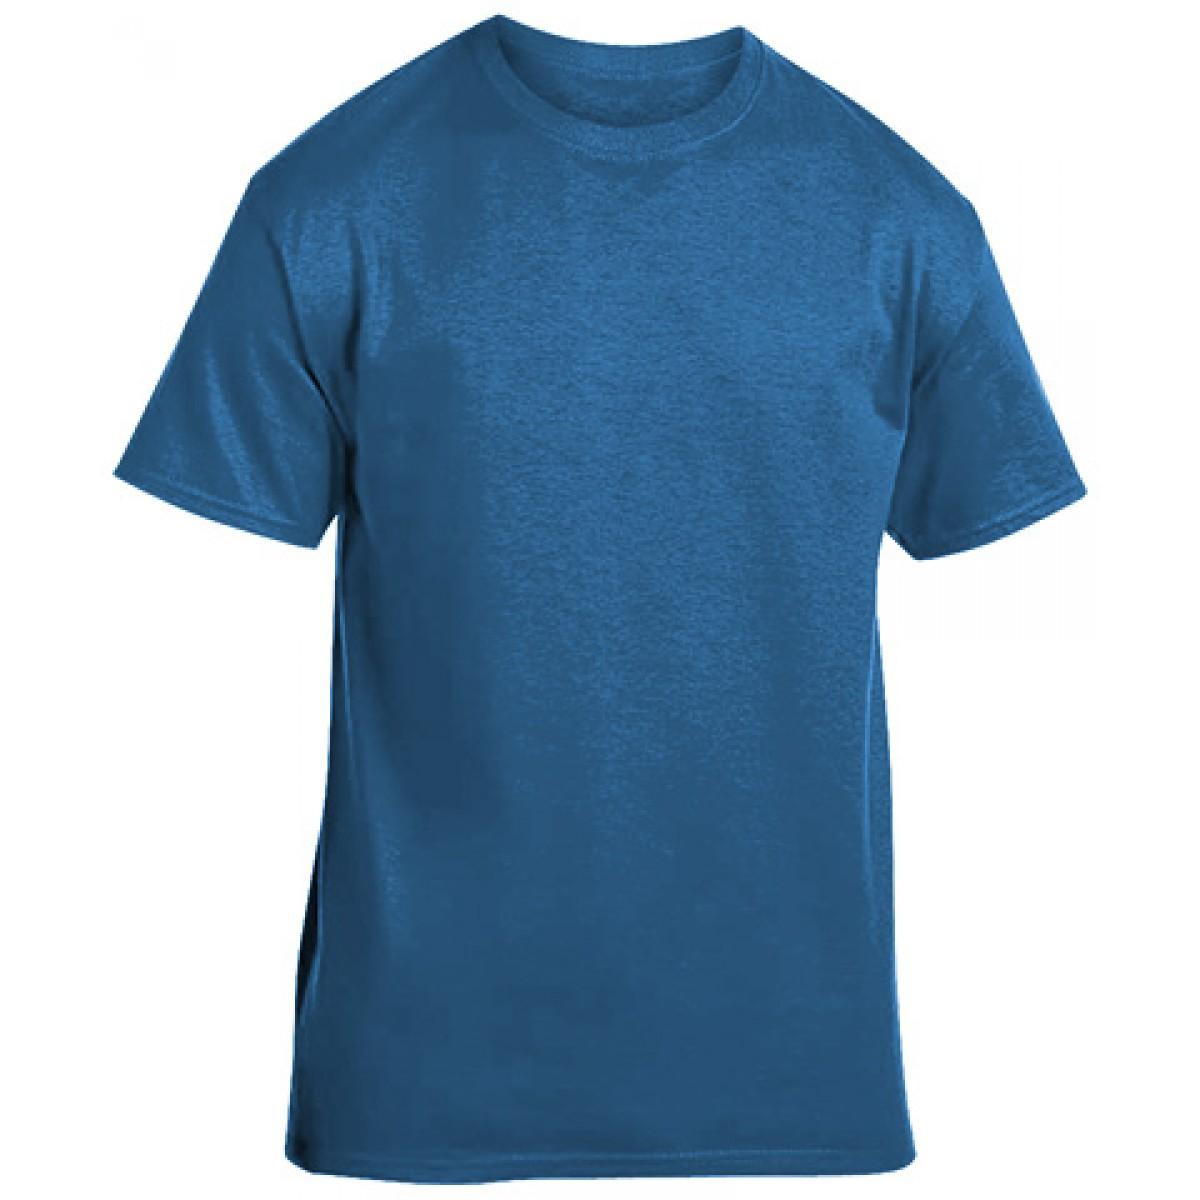 Soft 100% Cotton T-Shirt-Sapphire-M